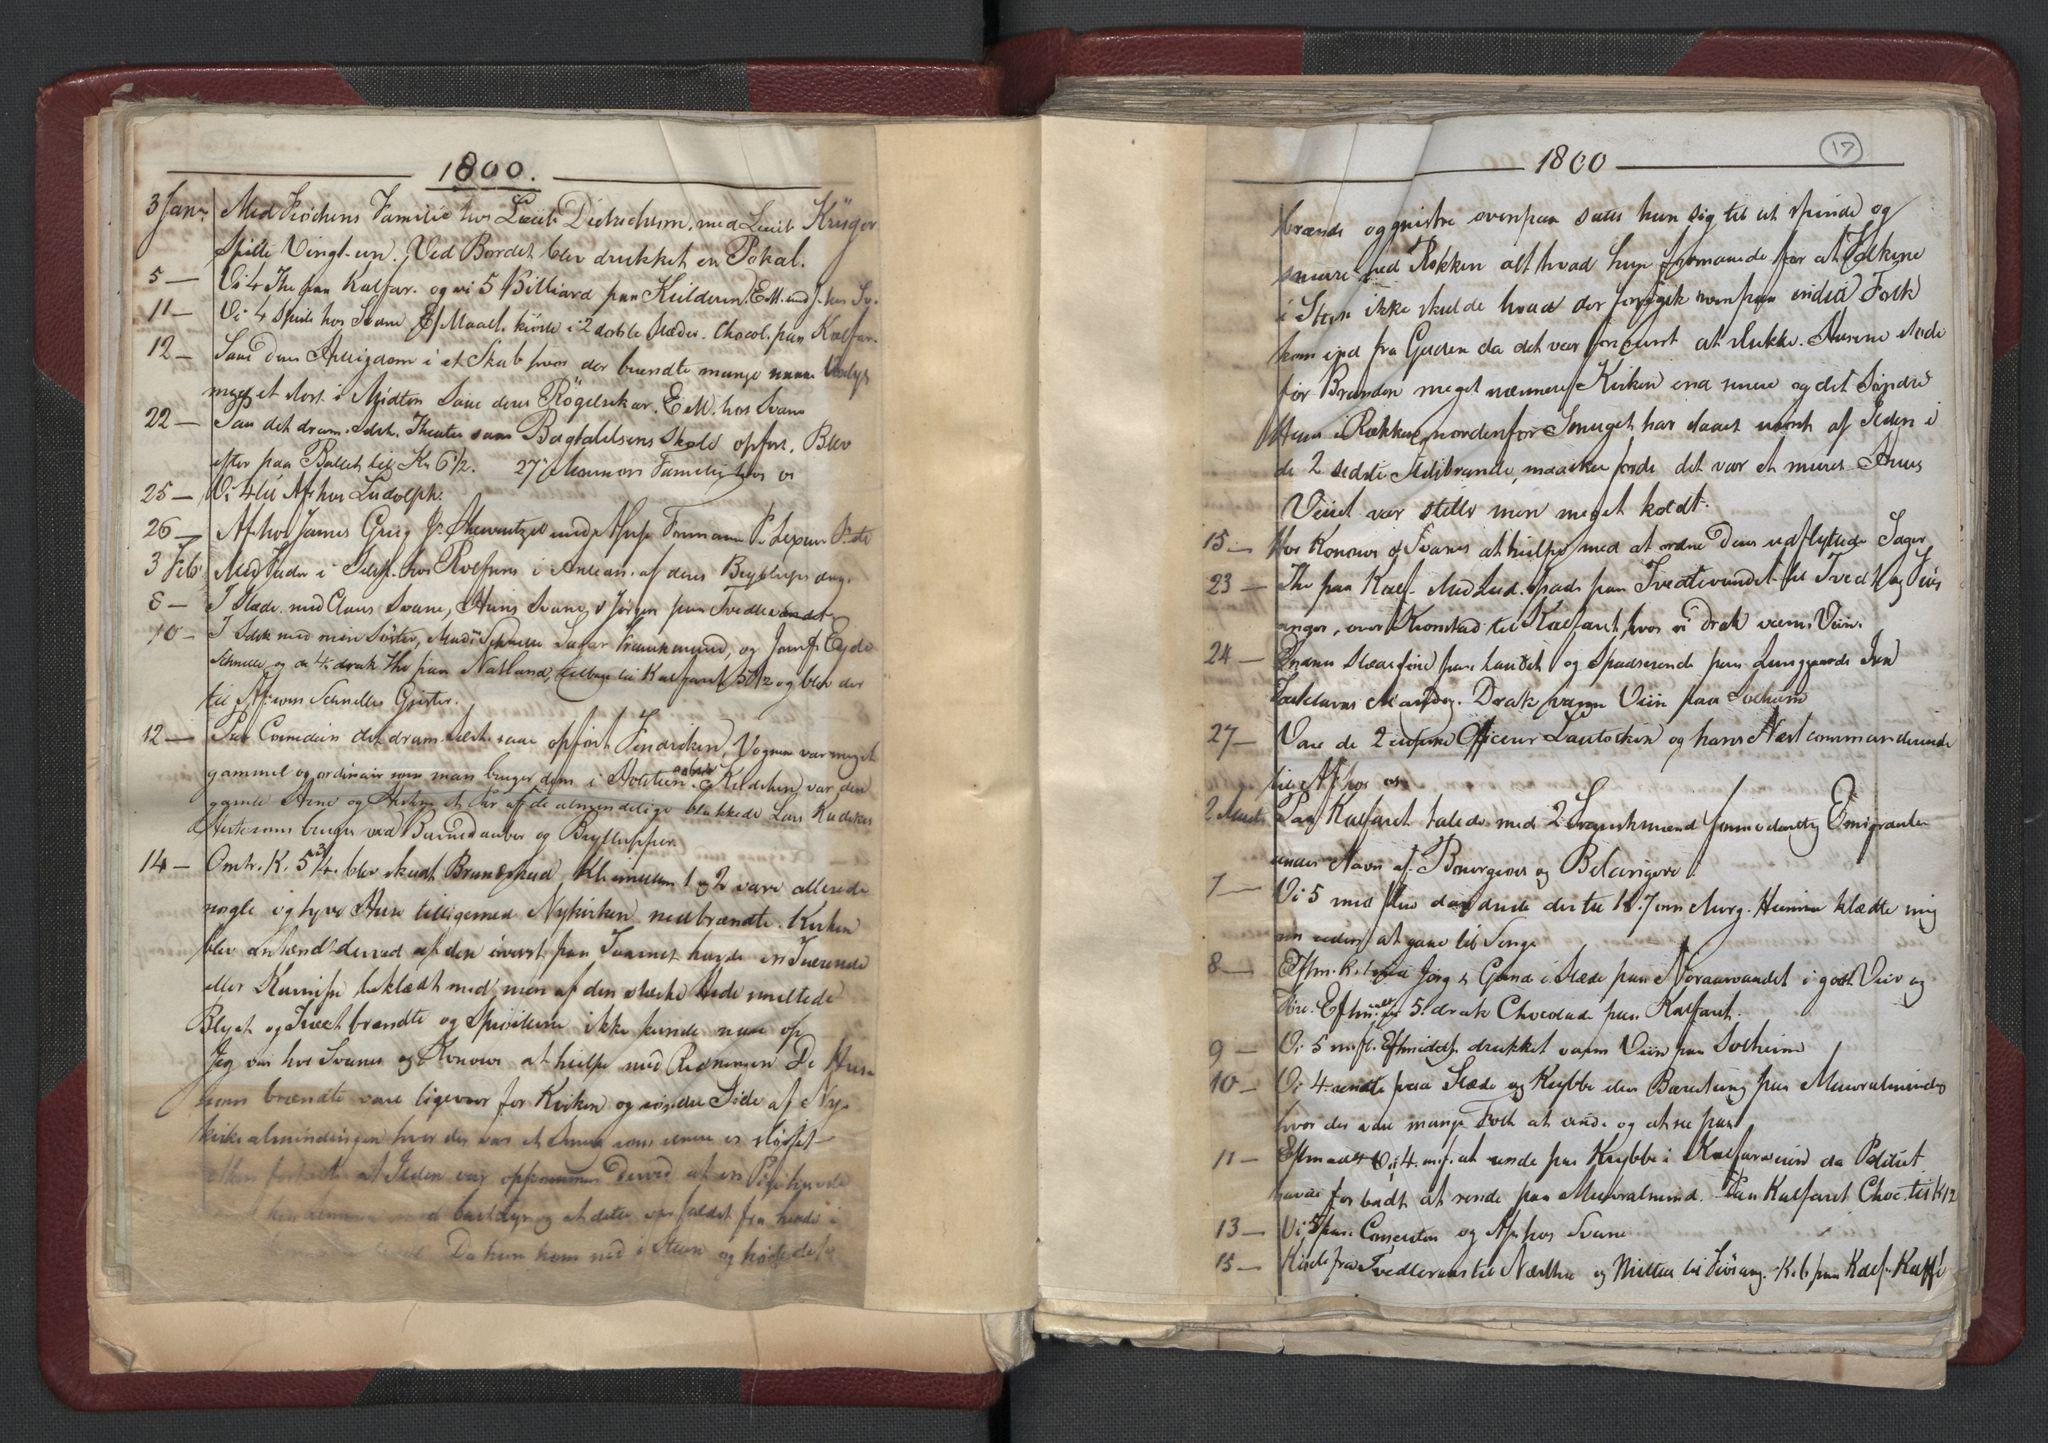 RA, Meltzer, Fredrik, F/L0001: Dagbok for årene 1796-1808, 1811, 1817, 1796-1817, s. 16b-17a